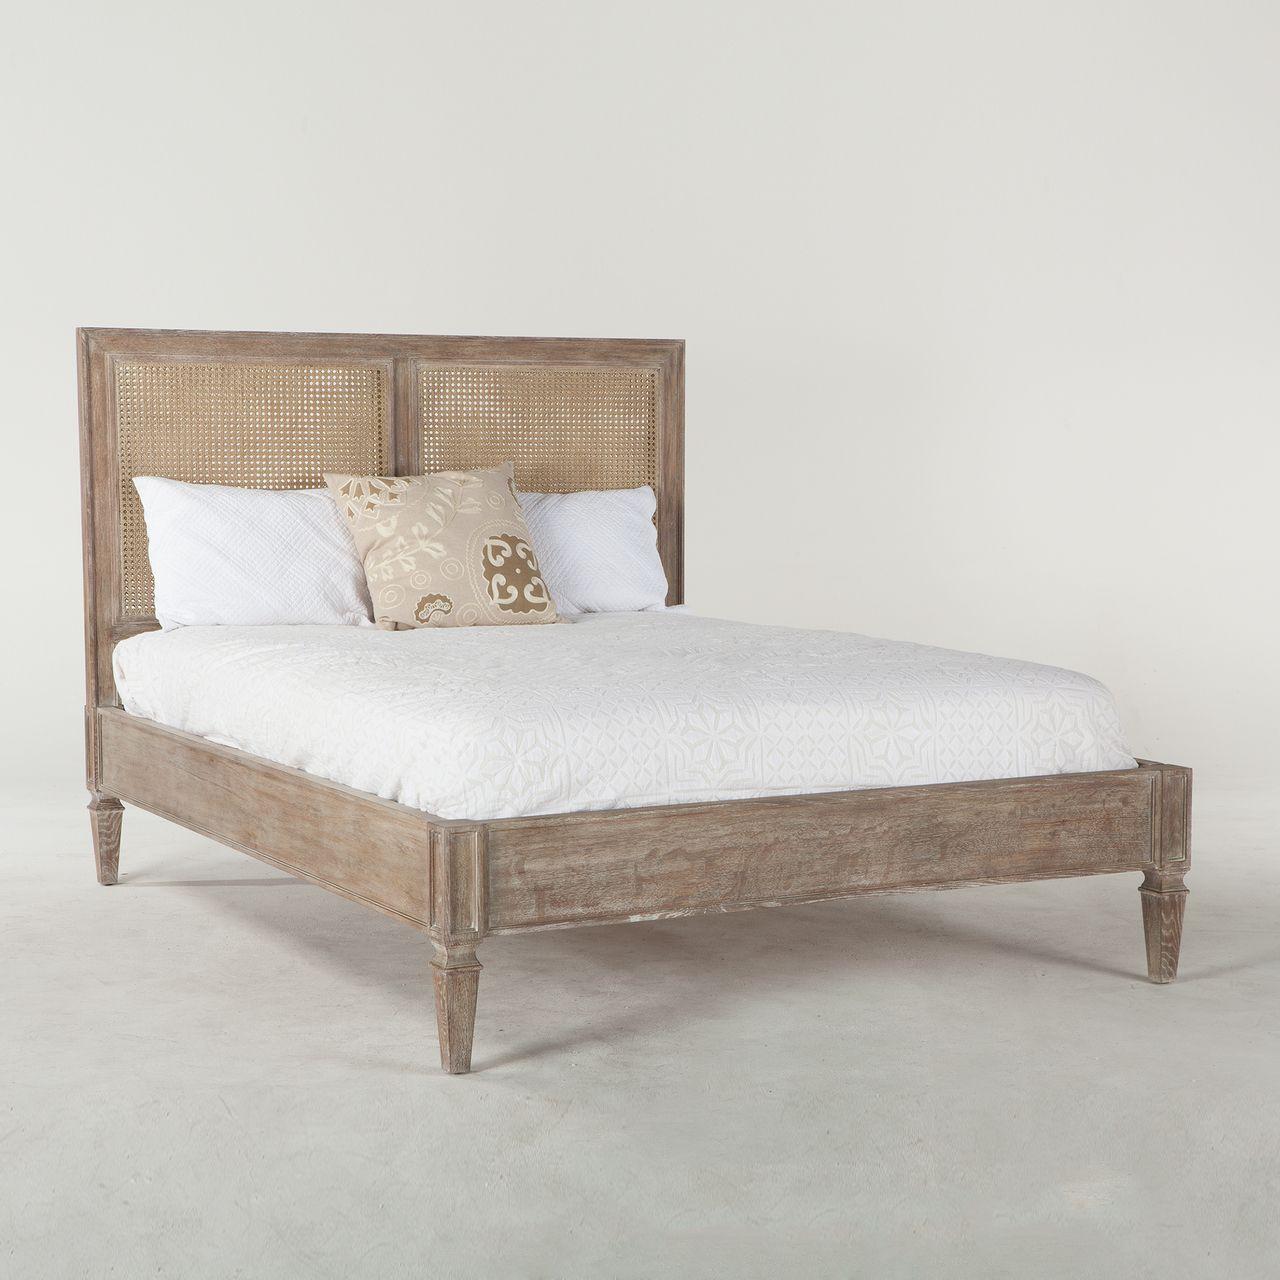 Shop our Parisian Vintage Grey Oak Queen Size Platform Bed Frame on ...